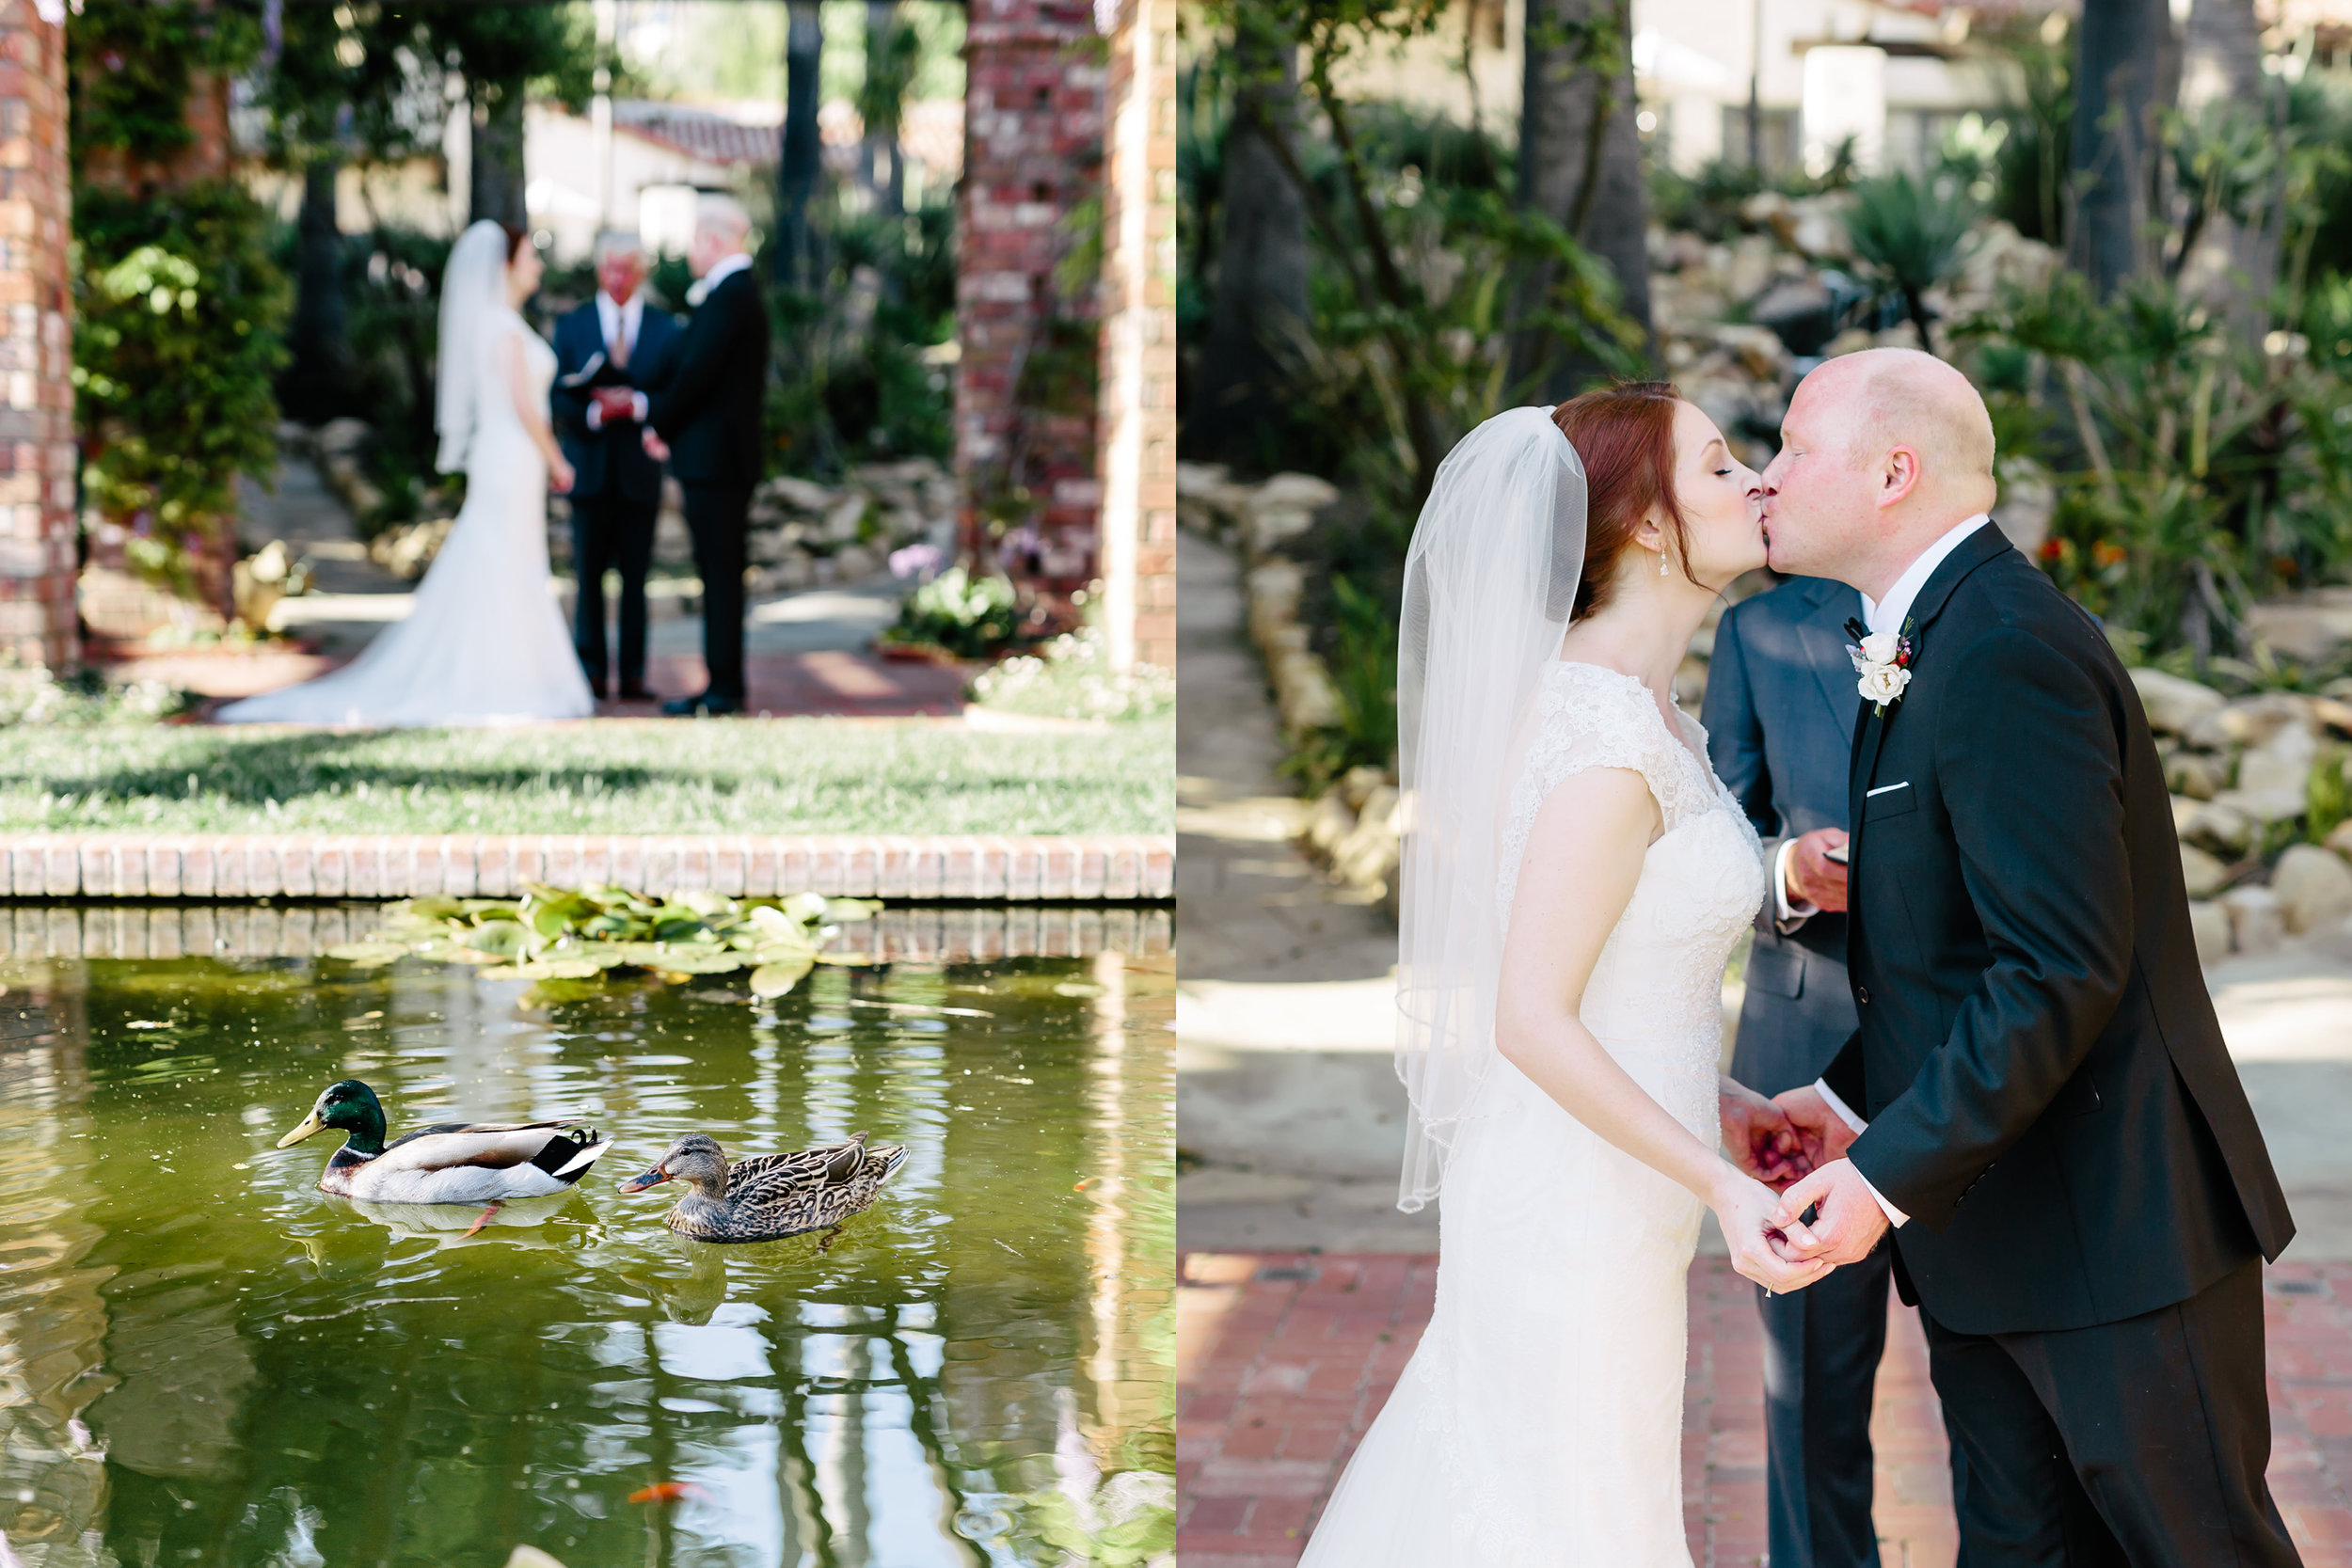 santa-barbara-elopement-wedding-planner-coordinator-day-of-el-encanto-belmond-resort-elope-lily-pond-black-tie-riviera (5).jpg